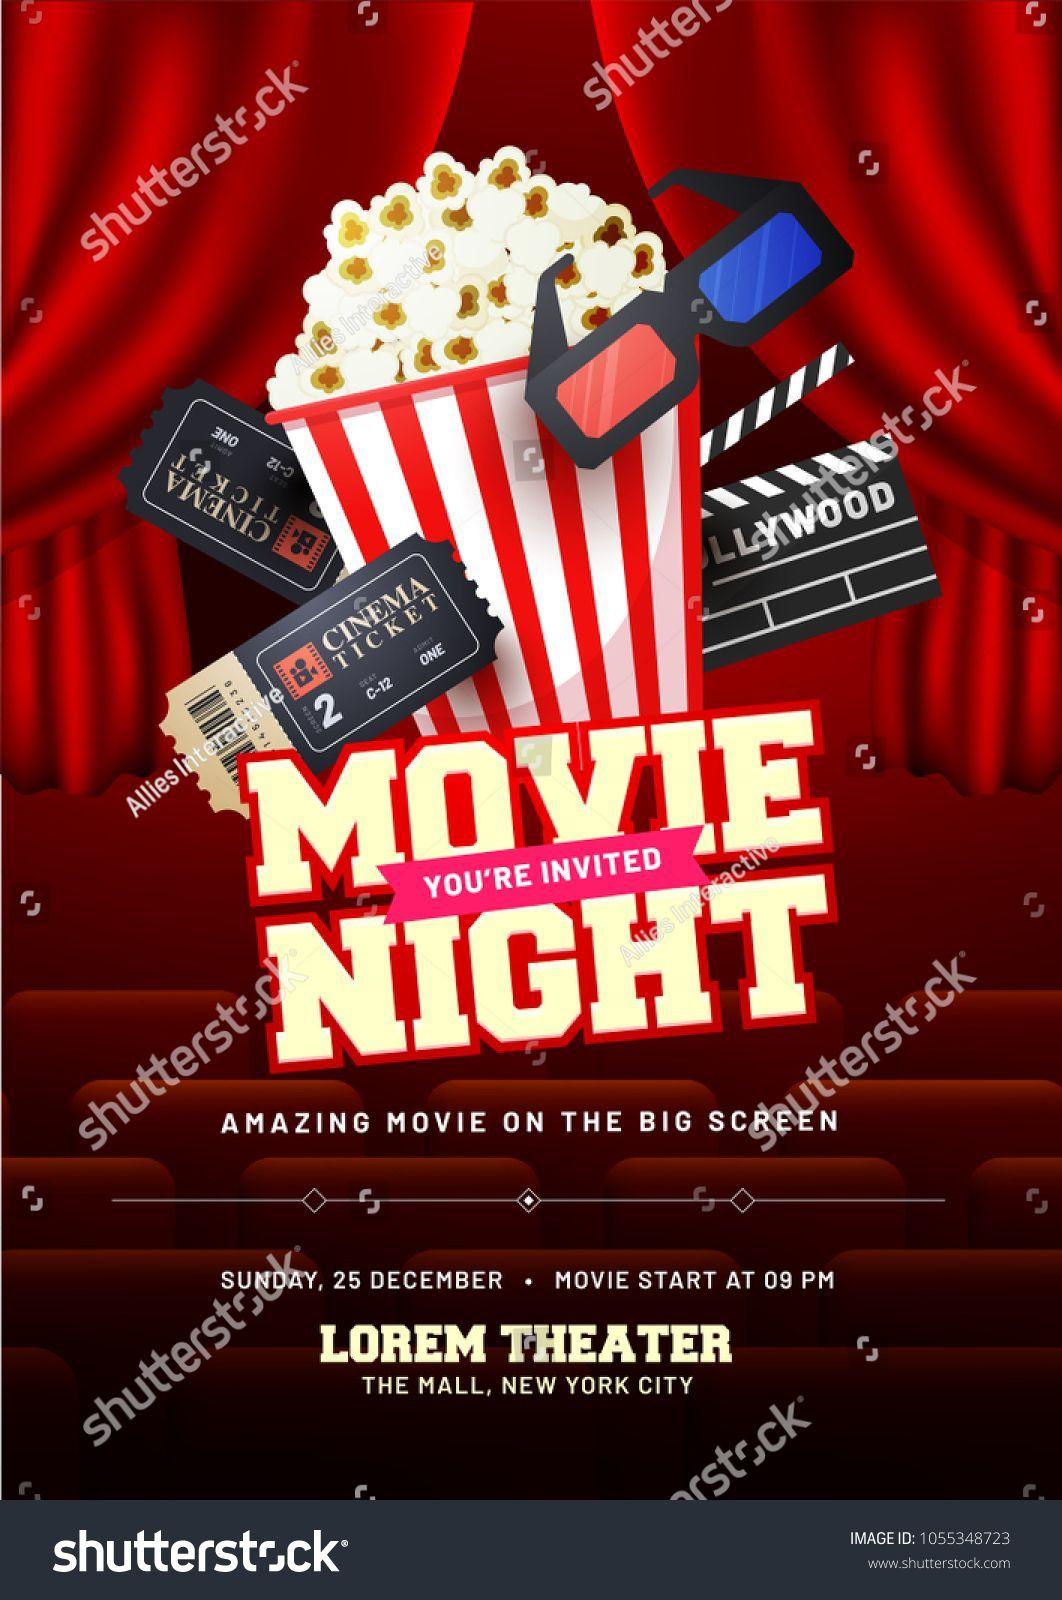 003 Stunning Movie Night Flyer Template Design  Templates Free Microsoft WordFull